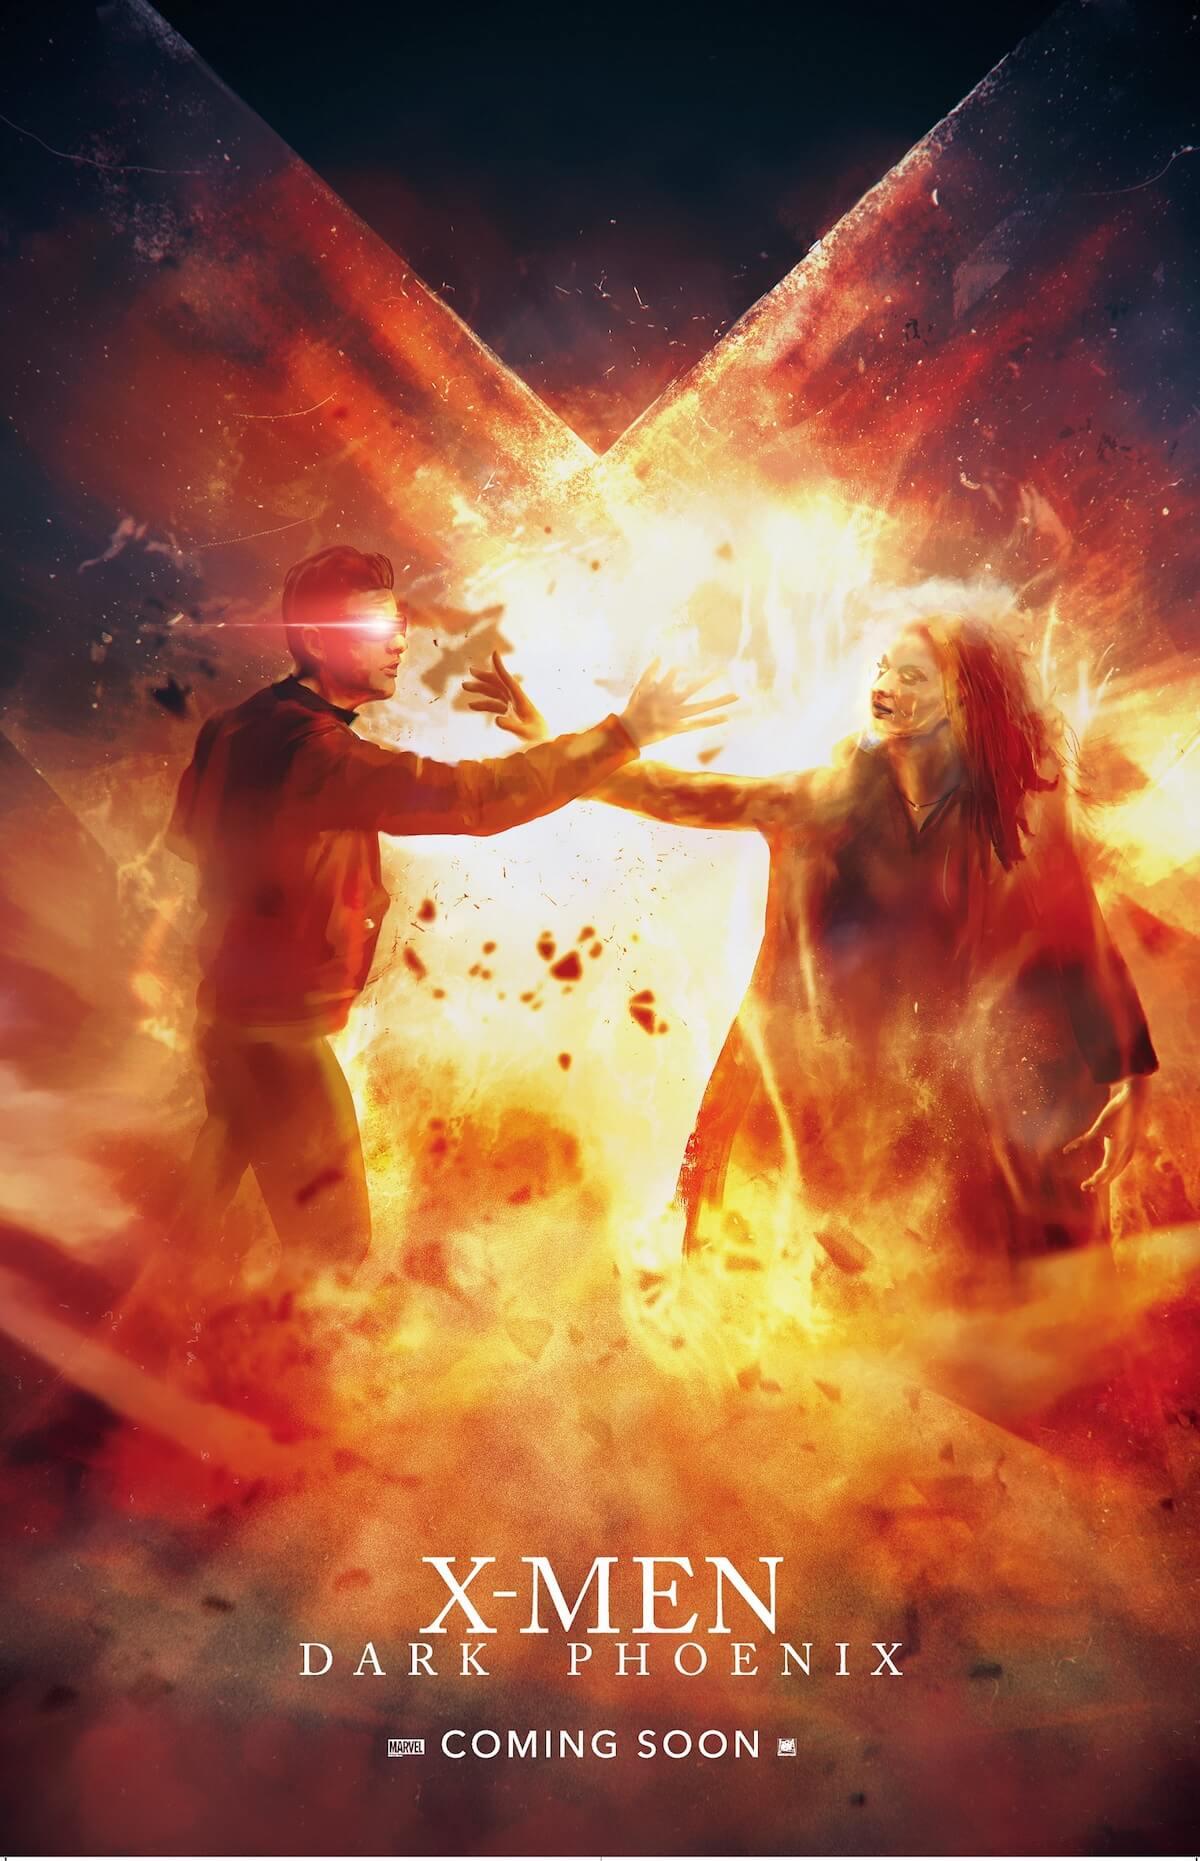 『X-MEN:ダーク・フェニックス』公開記念イベント<XーMEN DAY>が開催!ジーン役ソフィー・ターナーの特別映像解禁 film190517_xmenday_6